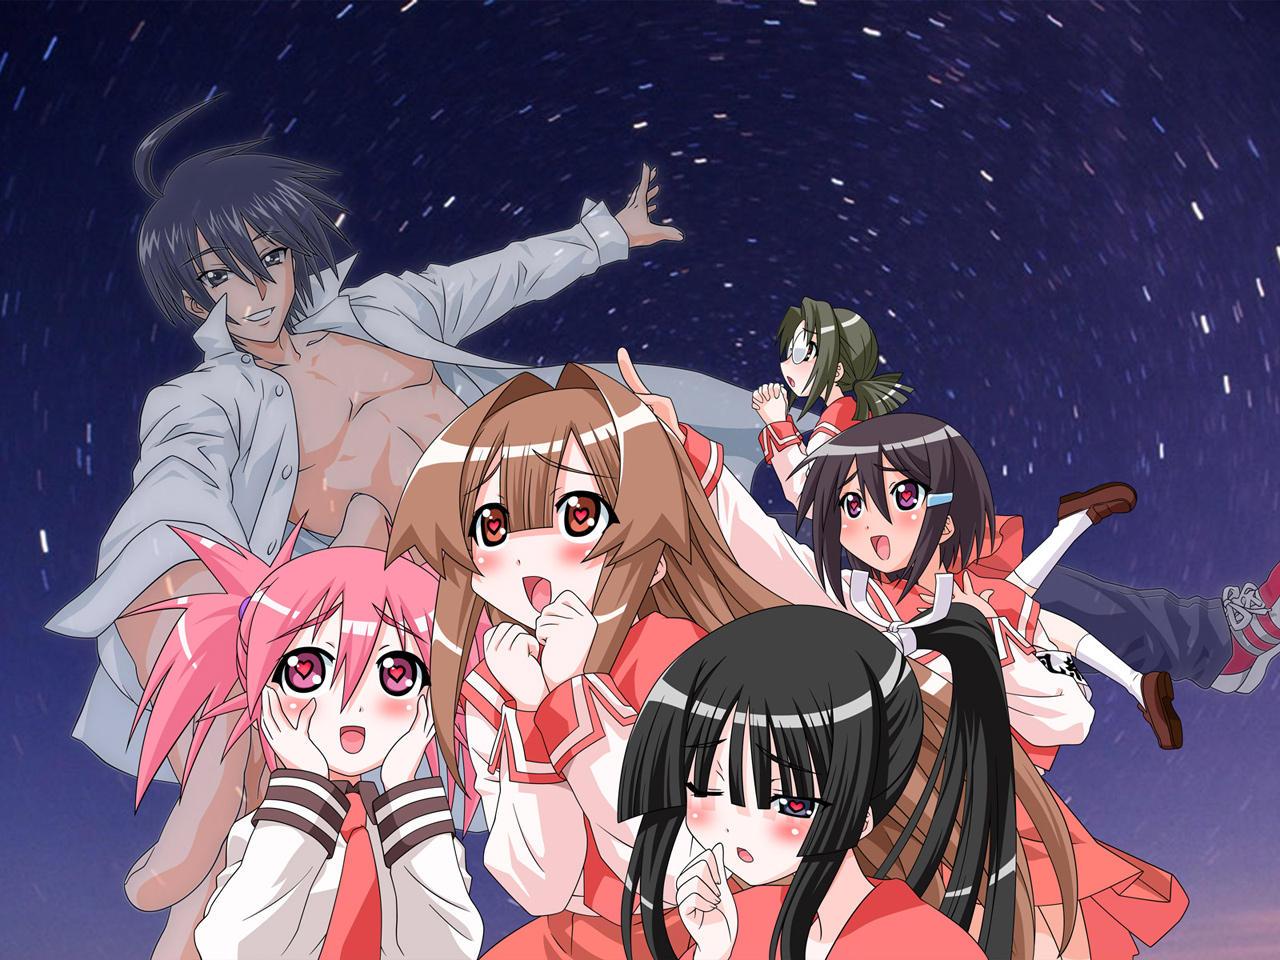 http://blog-imgs-45.fc2.com/a/n/k/ankosokuho/123673214089816327599_kanji-file-name-1440.jpg